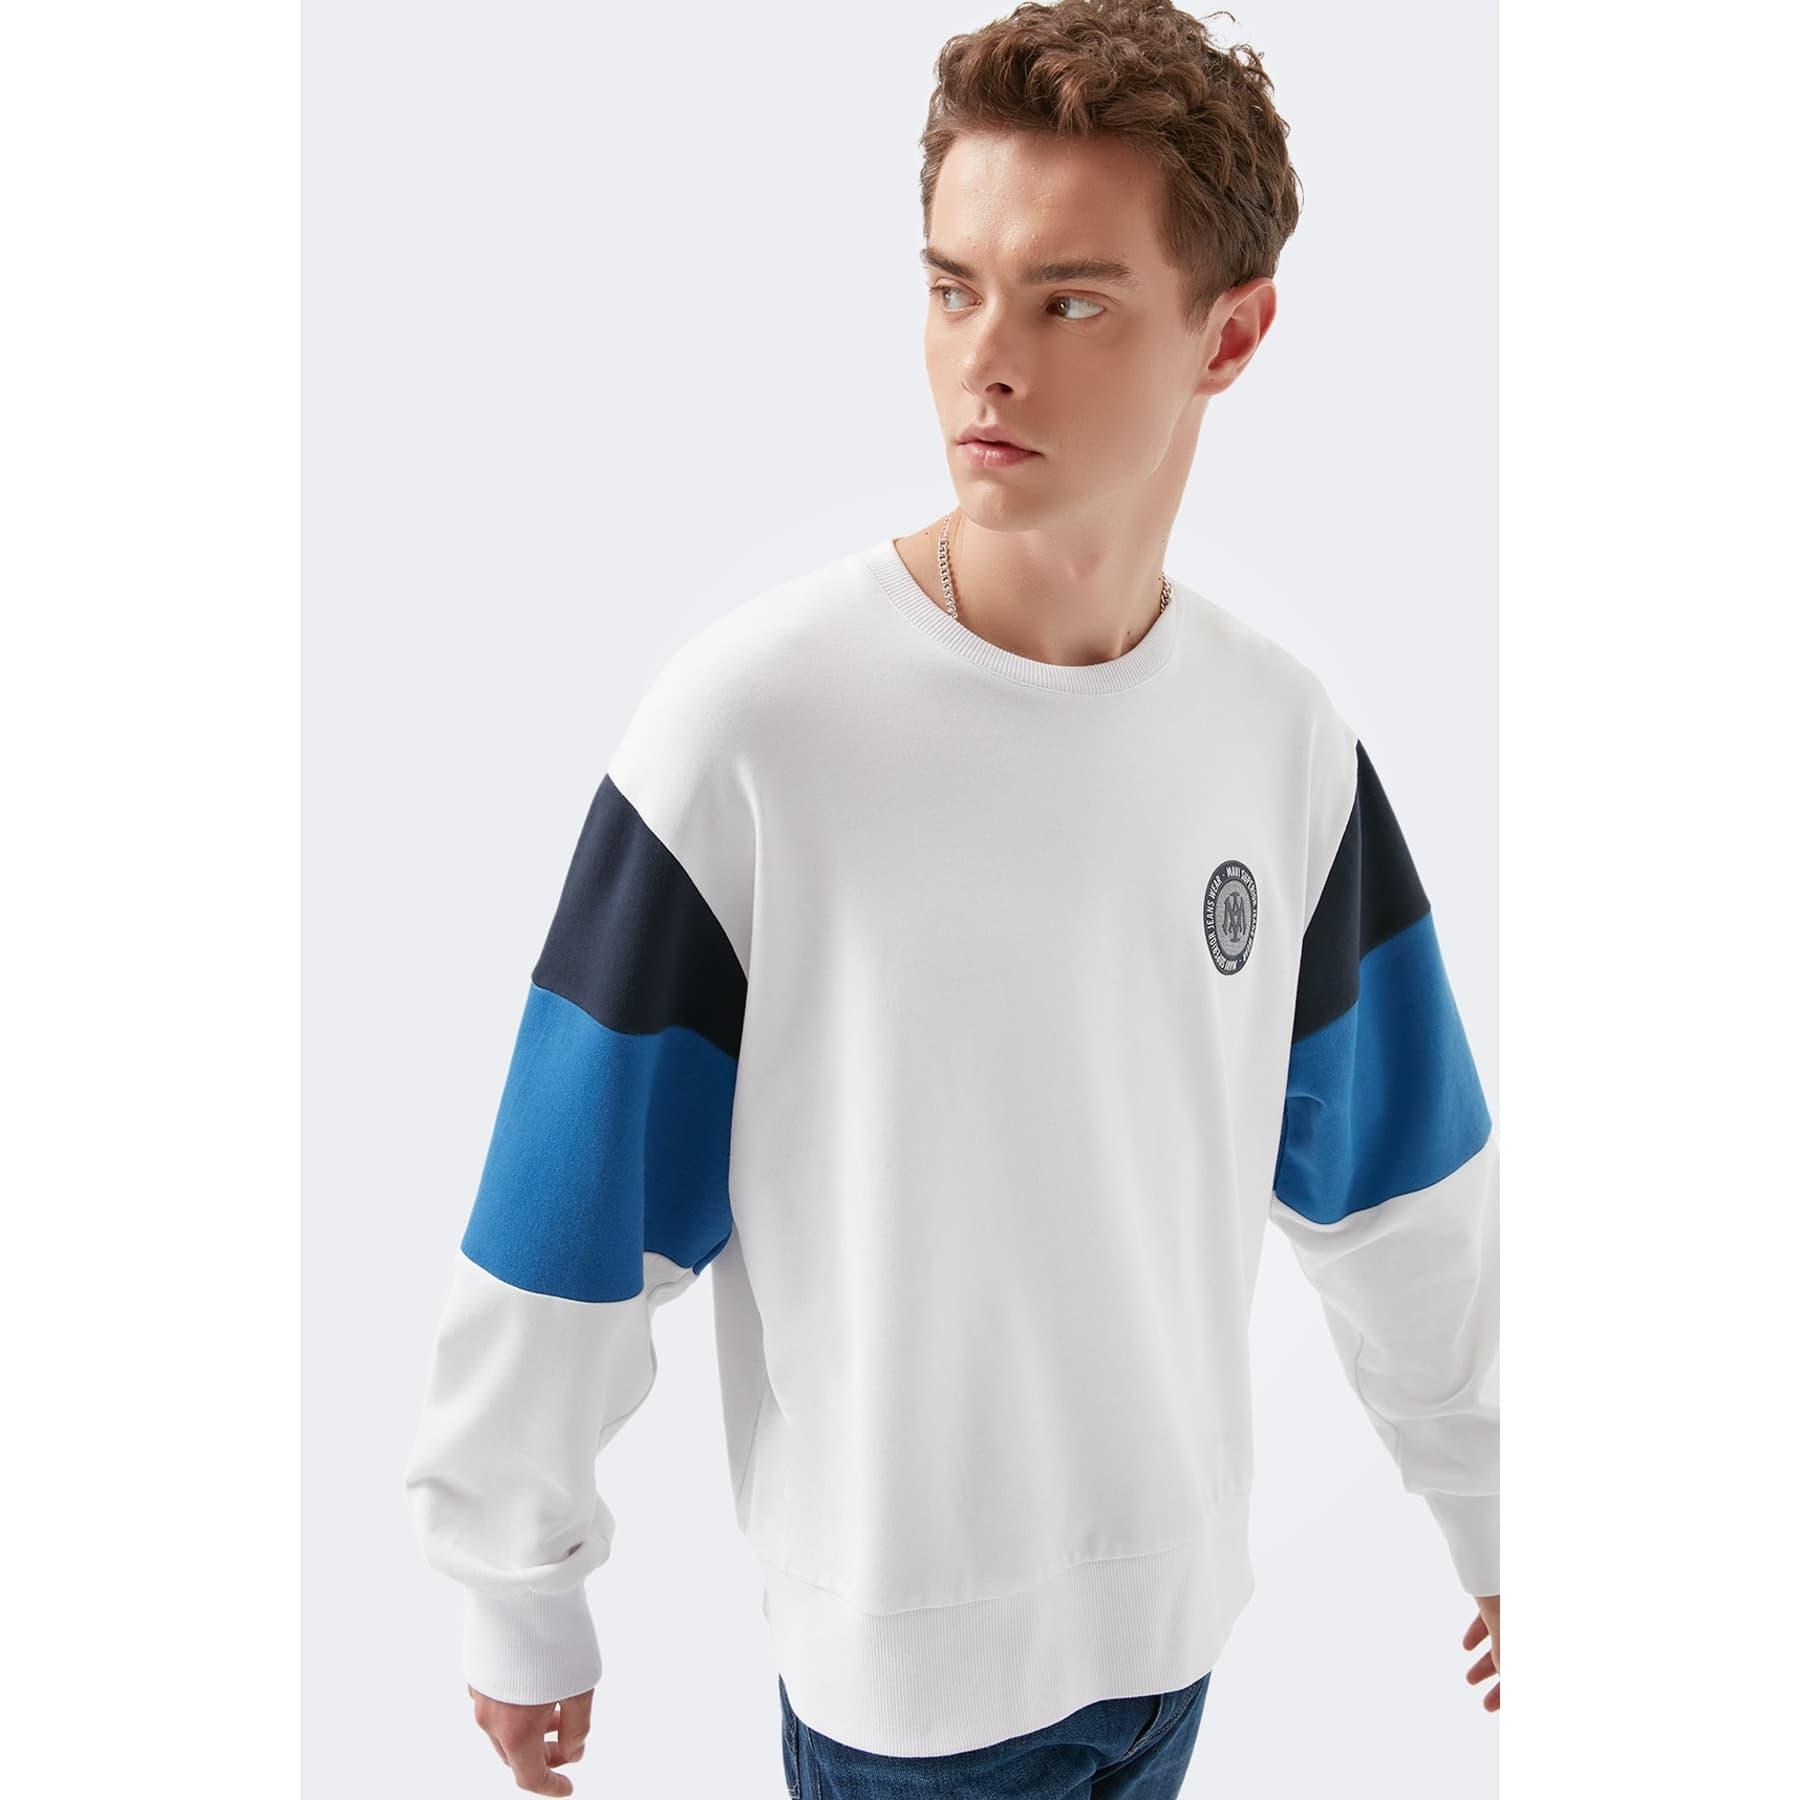 Mavi Jeans Blok Renkli Erkek Sweatshirt